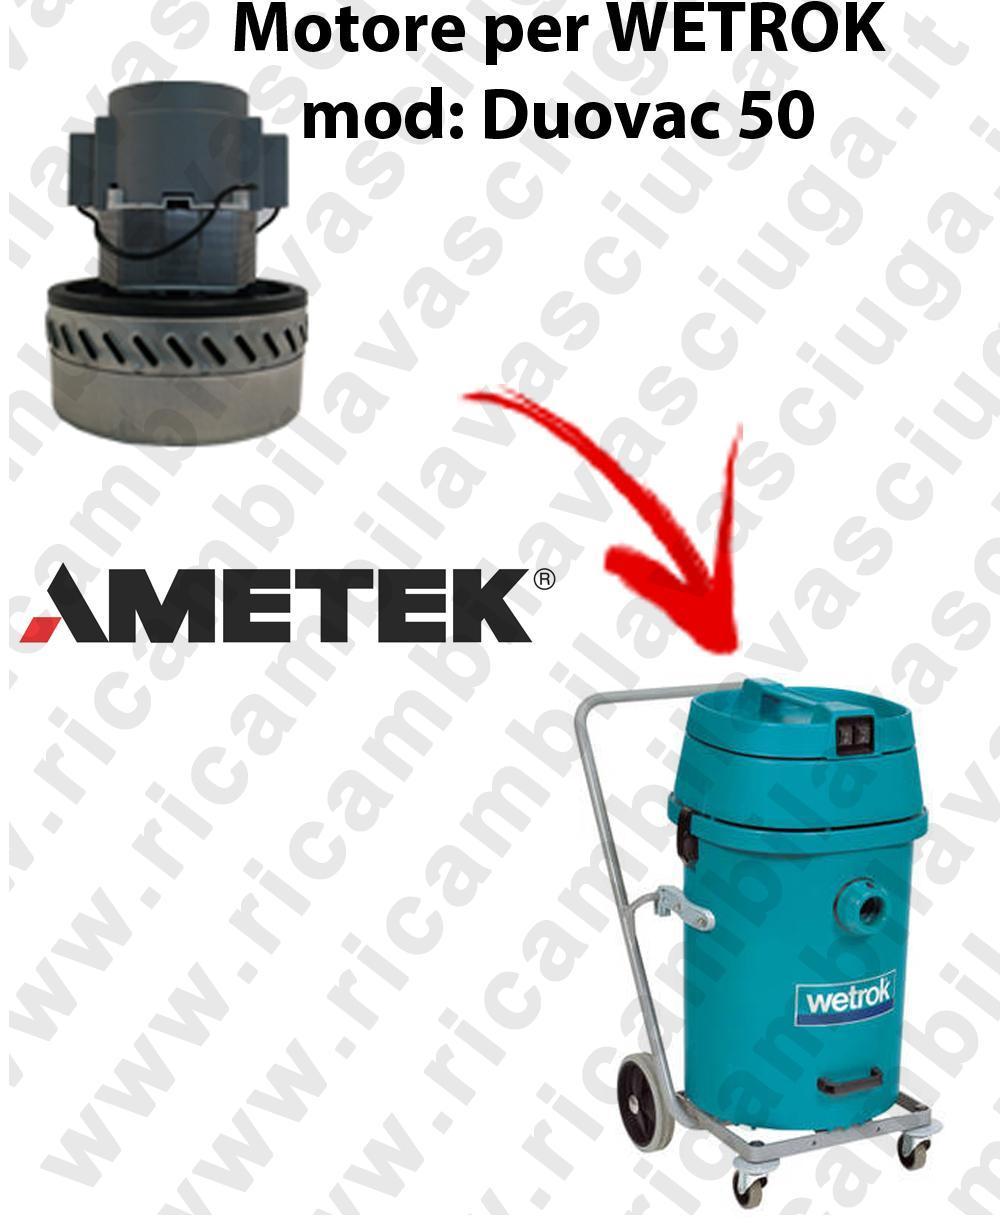 DUOVAC 50 Motore de aspiración AMETEK  para aspiradora WETROK